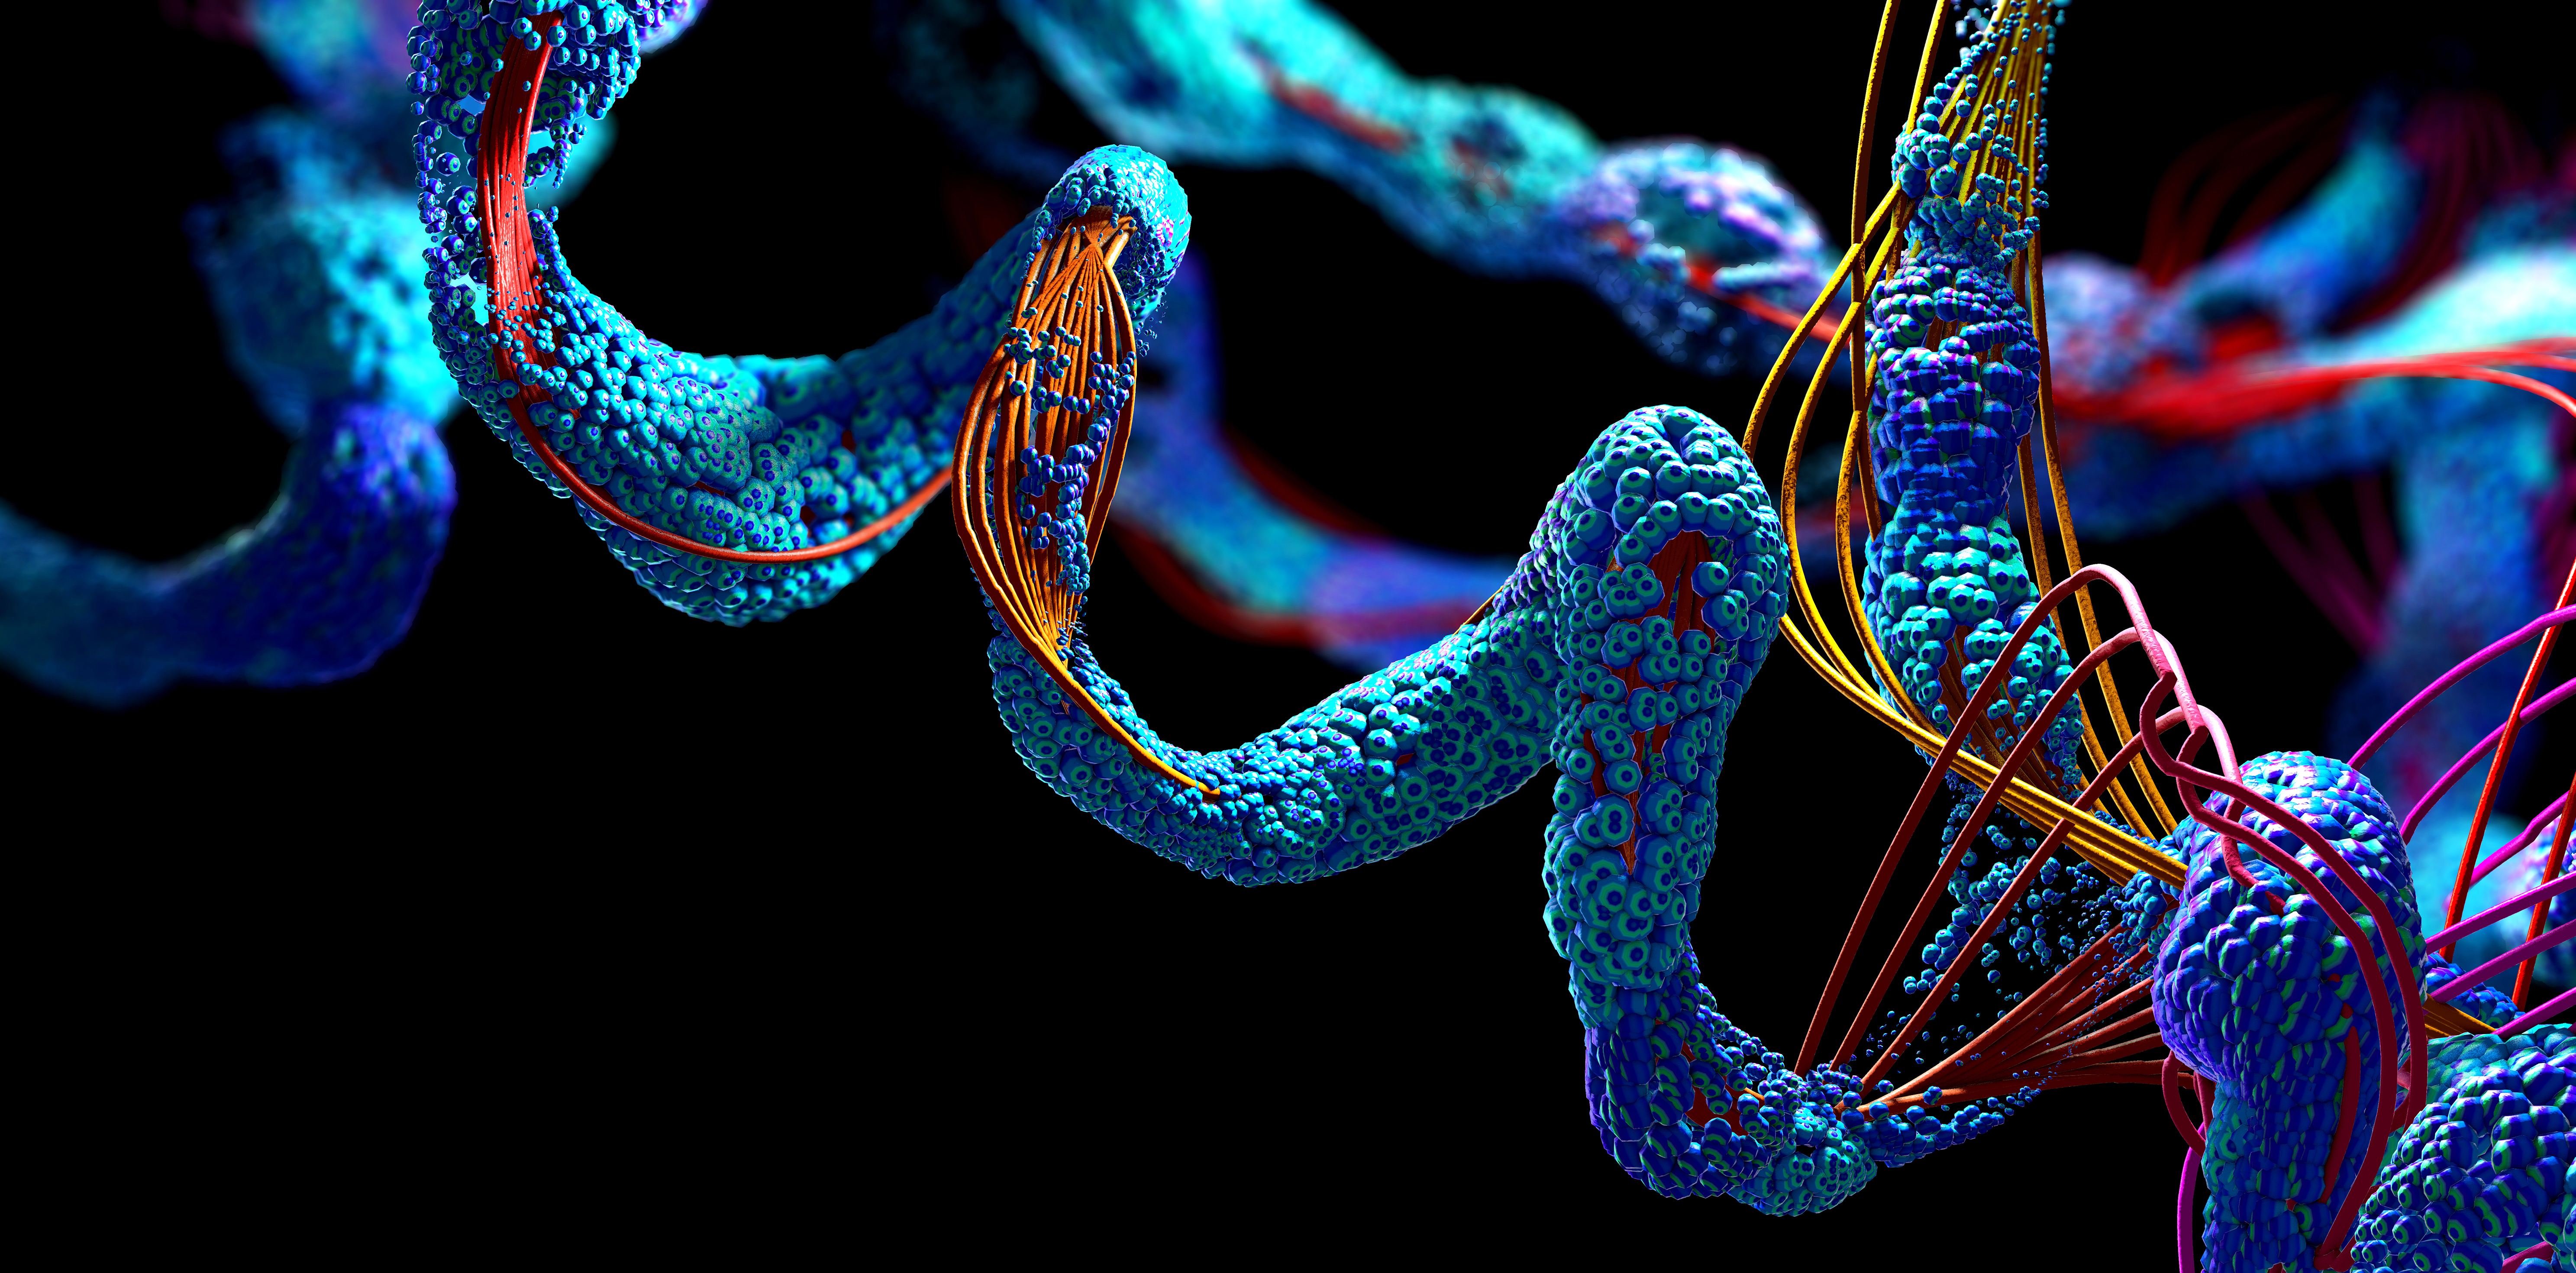 3D Illustration of Protein